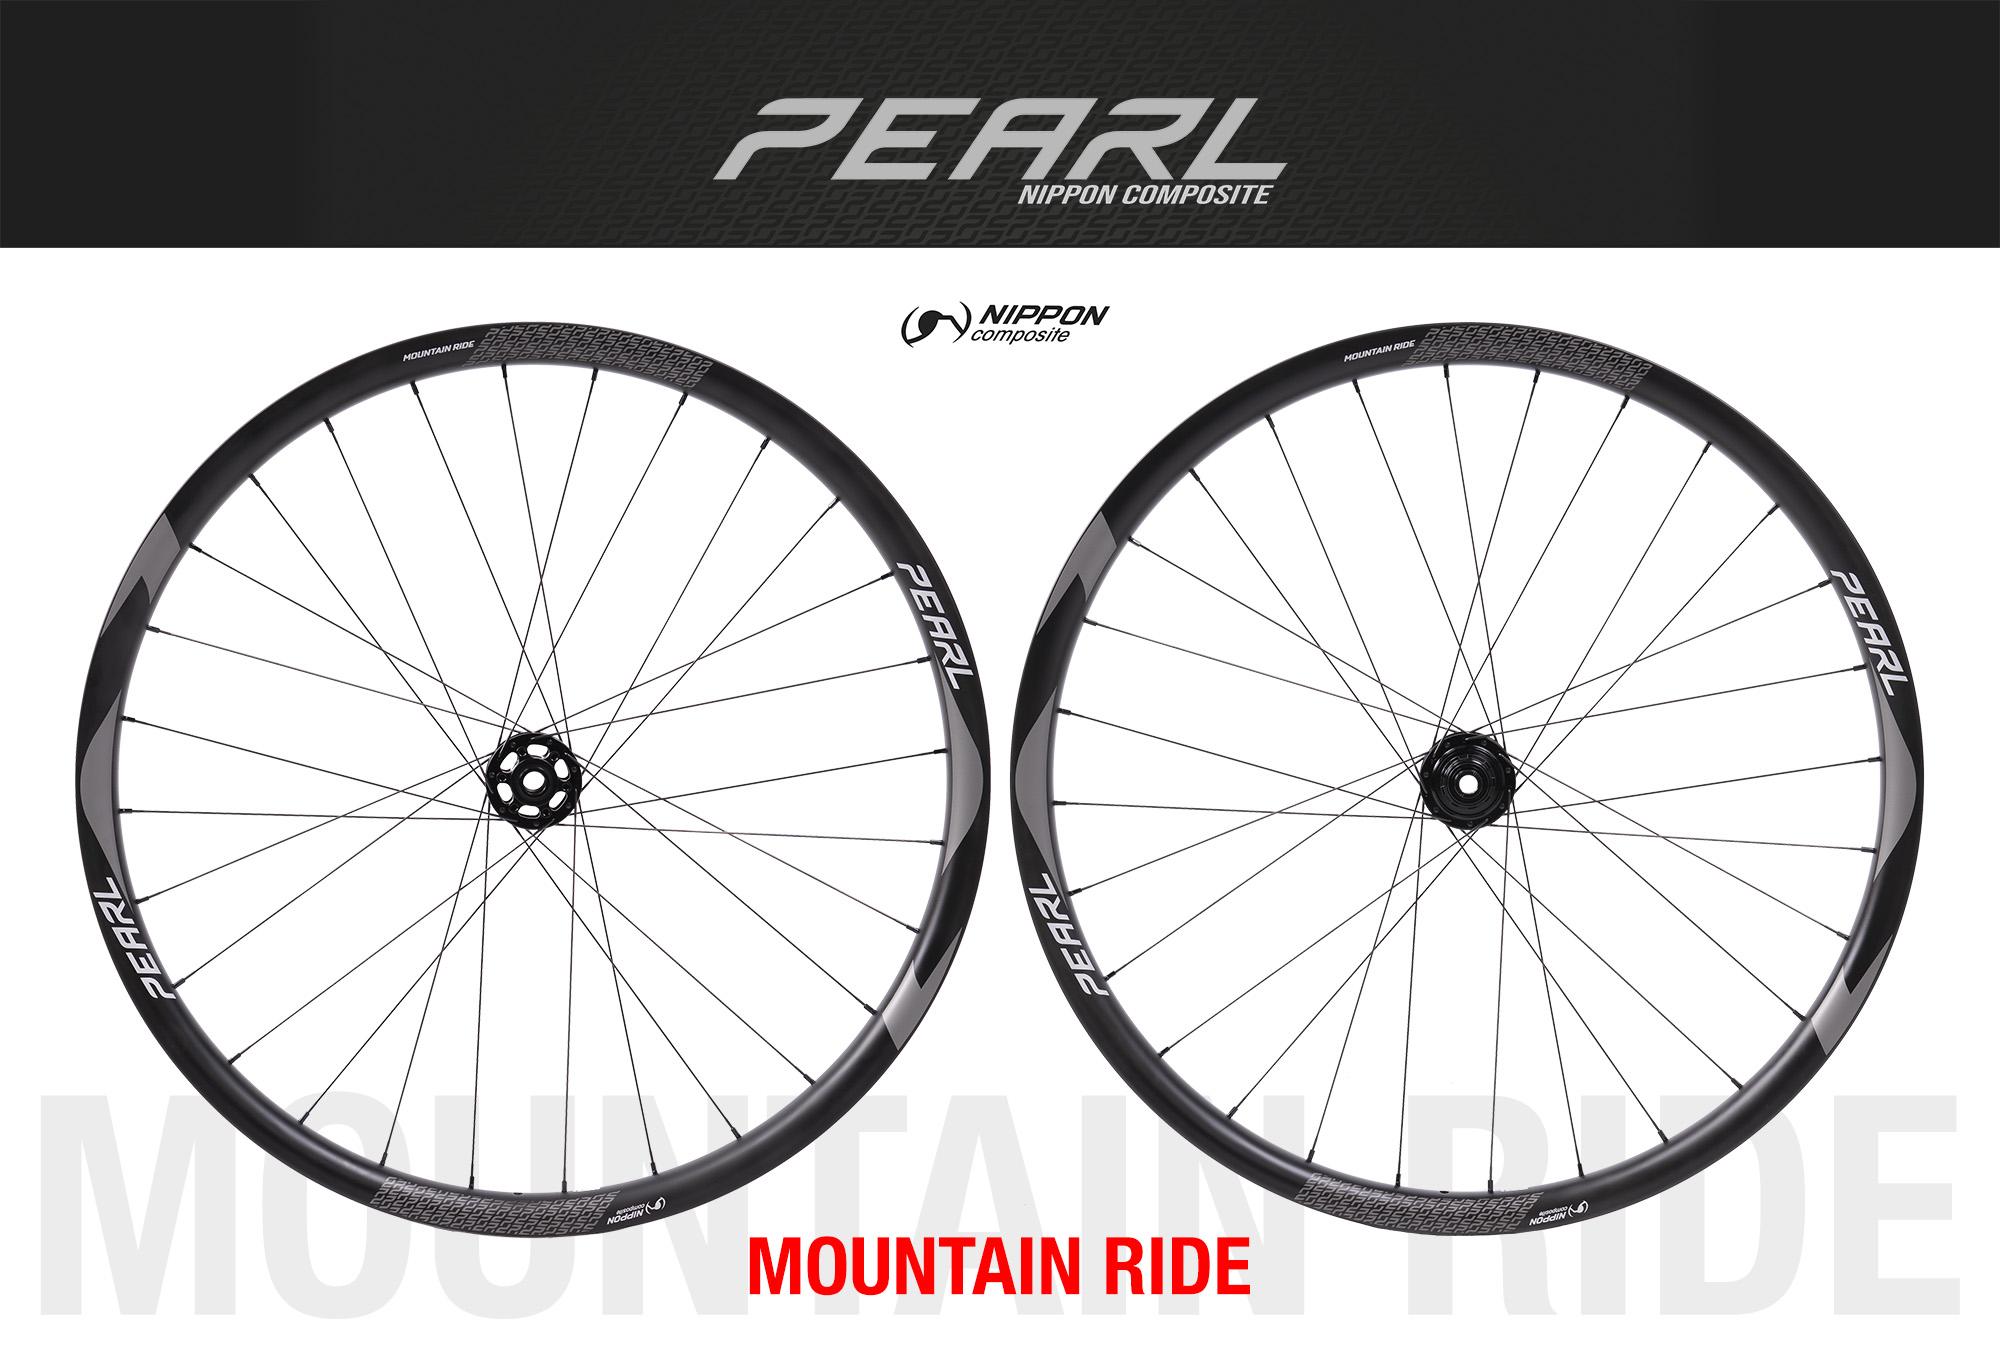 PEARL | MOUNTAIN RIDE 29er Carbon Wheelset